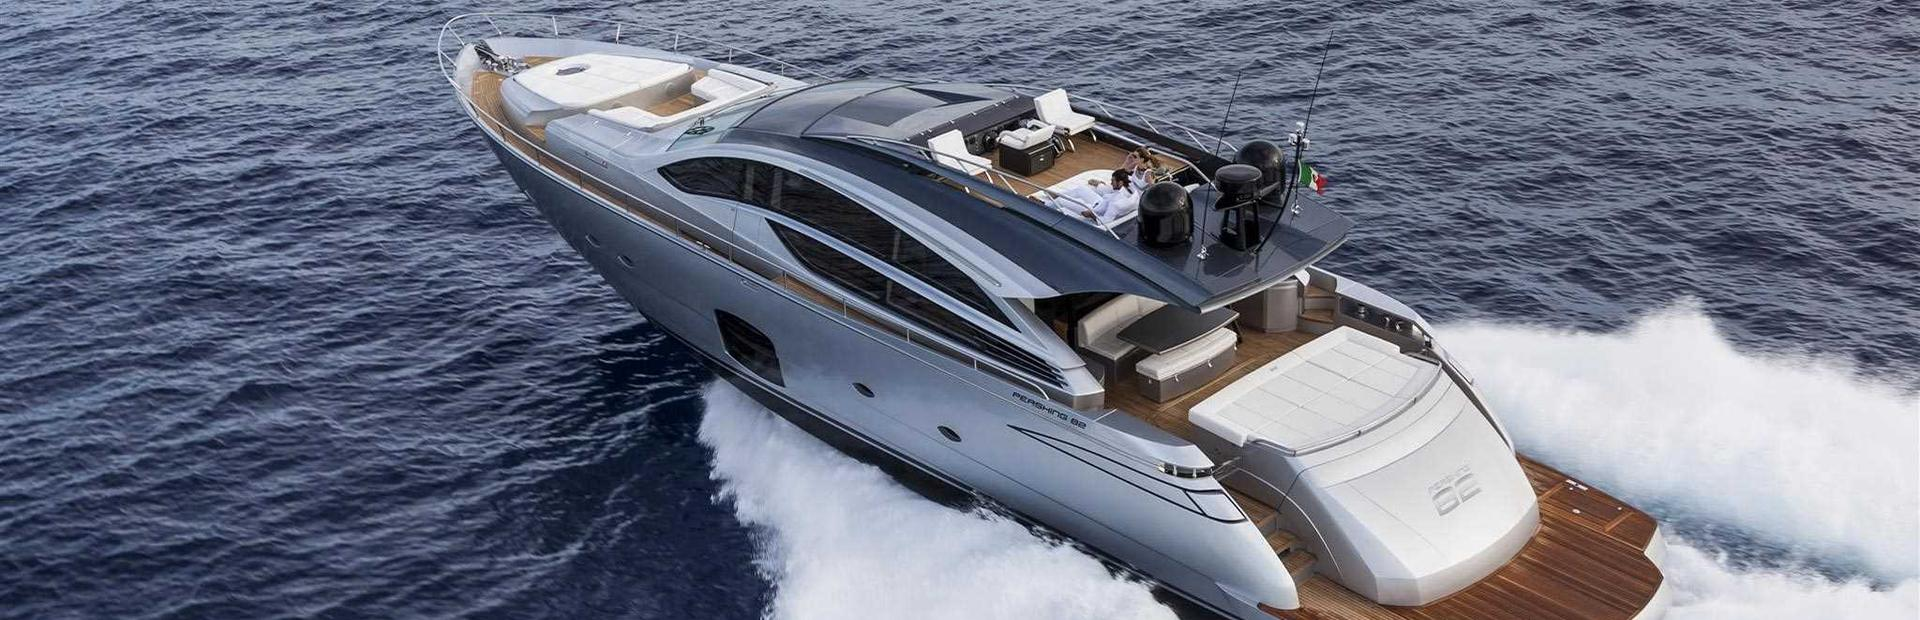 Pershing 82 Yacht Charter